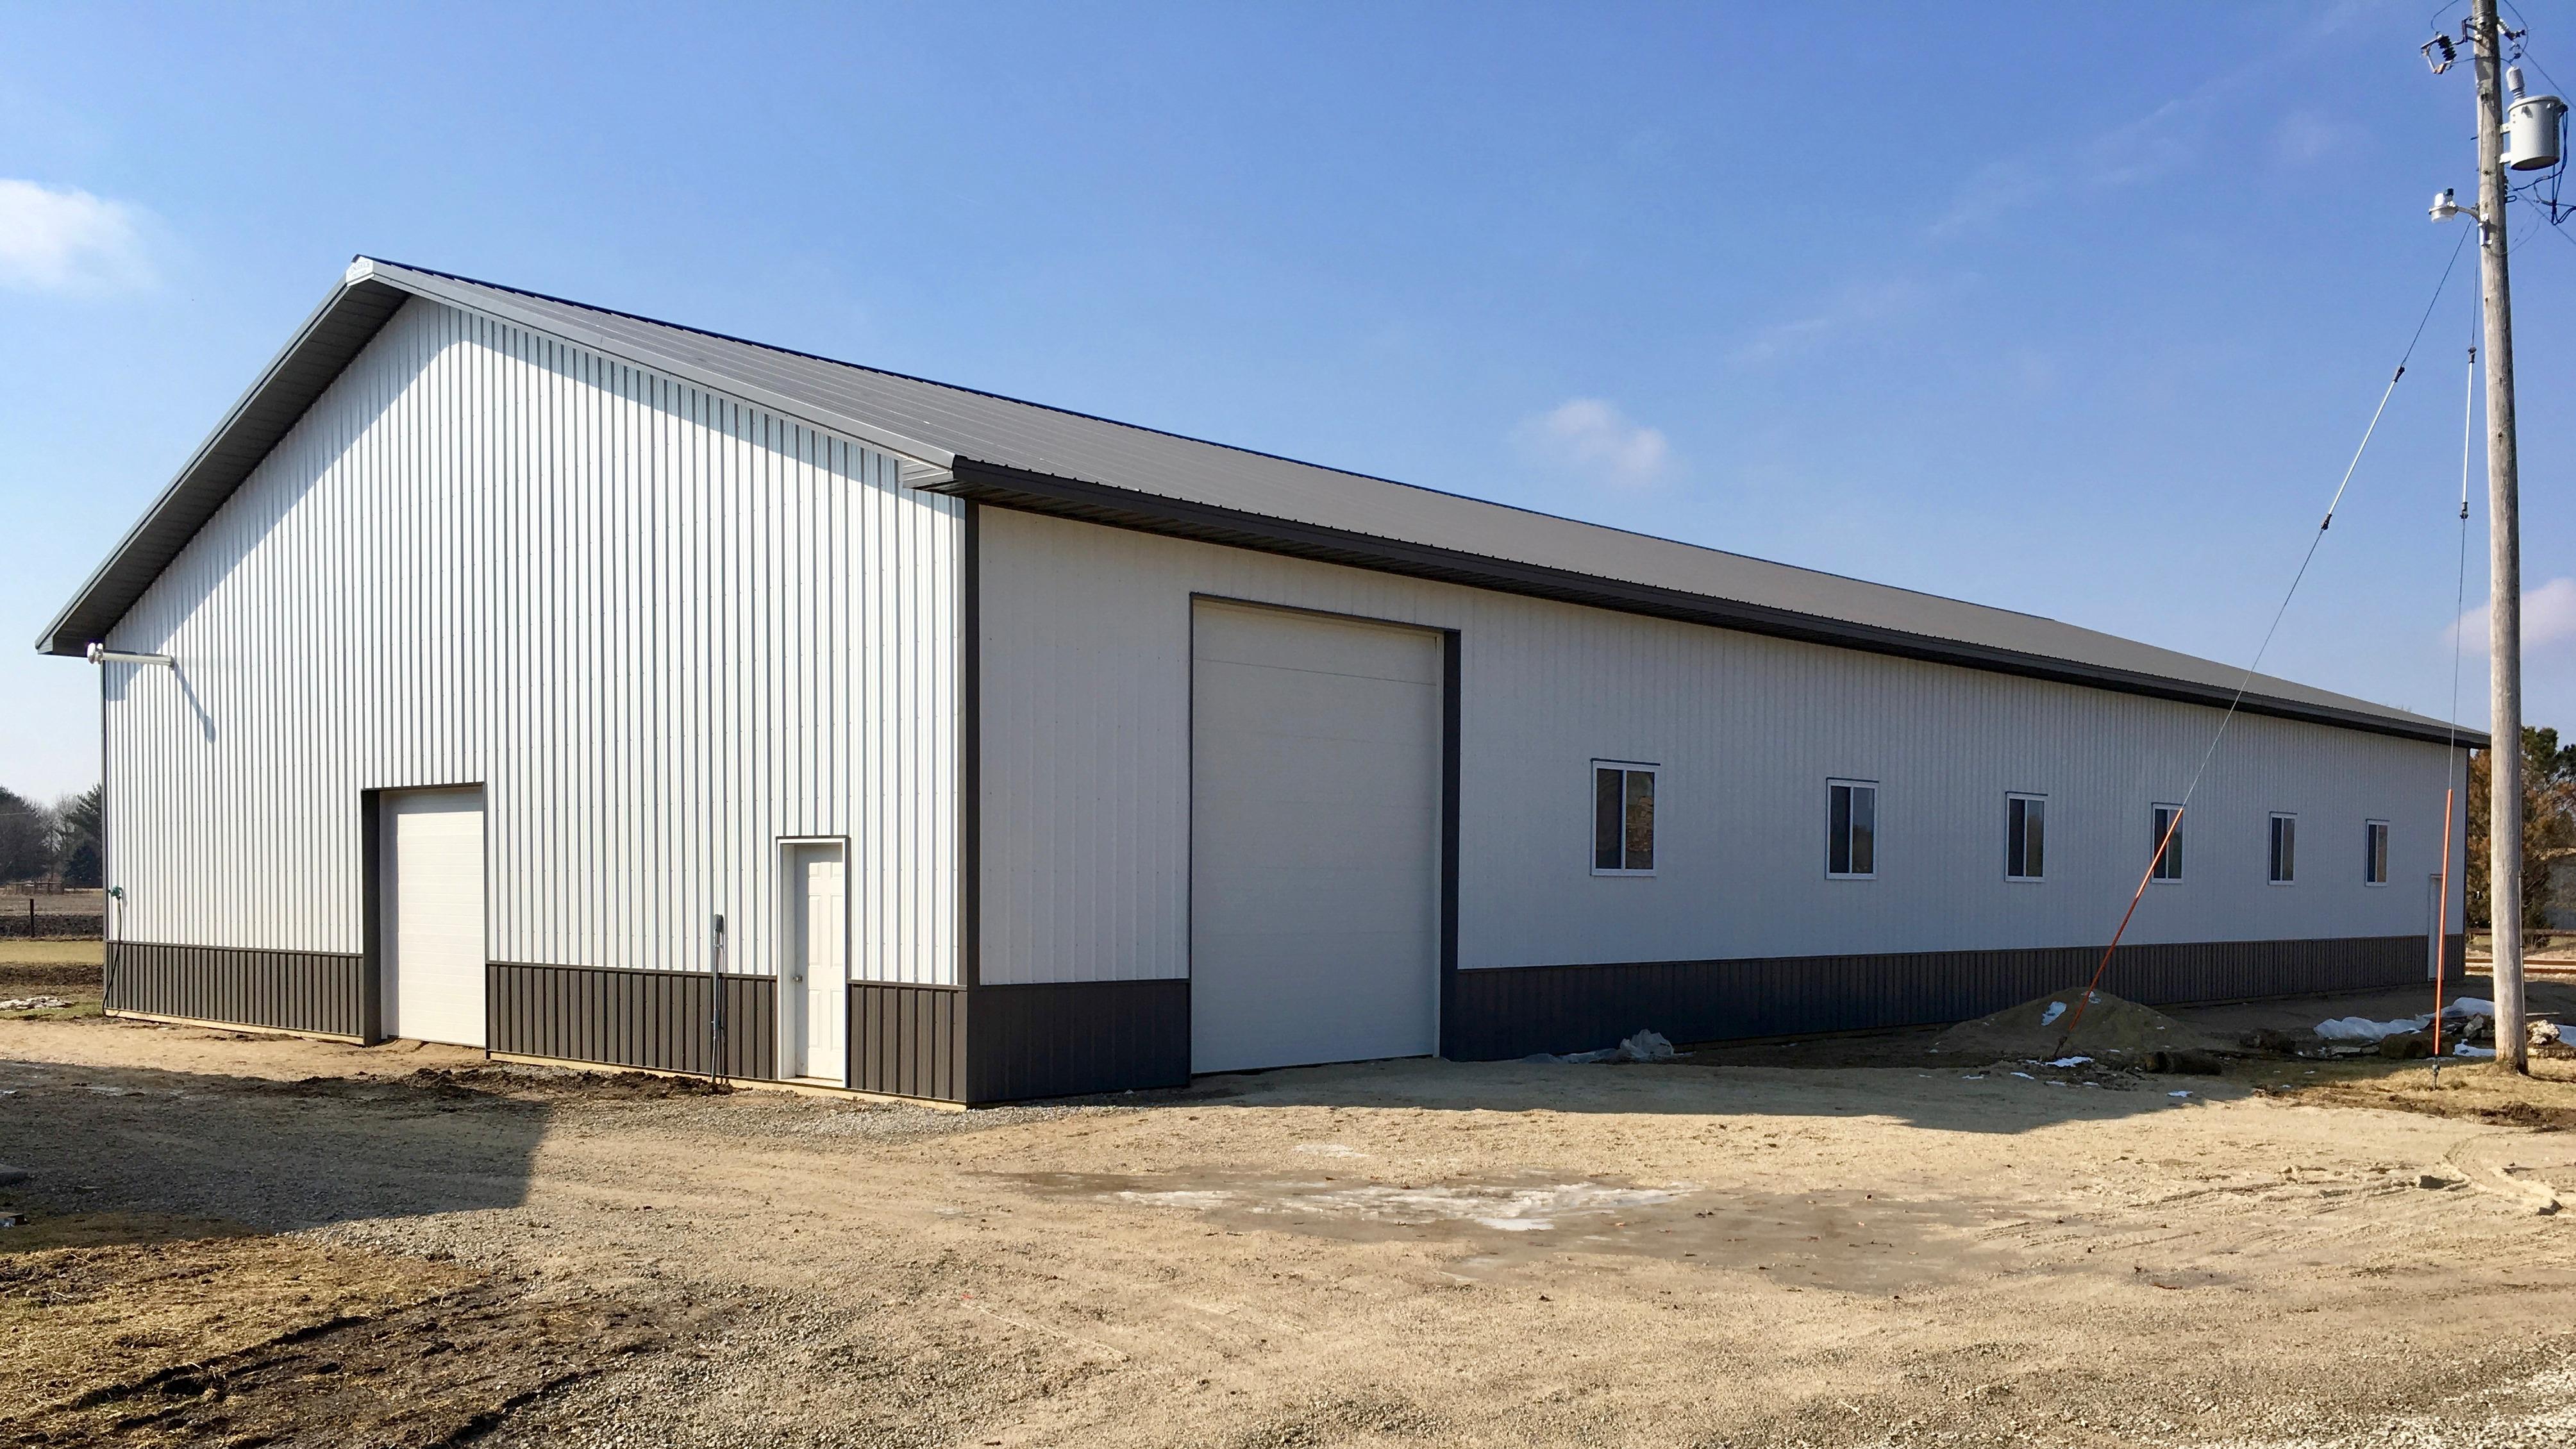 Pole Barn Builders Lancaster Ohio 24x32 Pole Garage